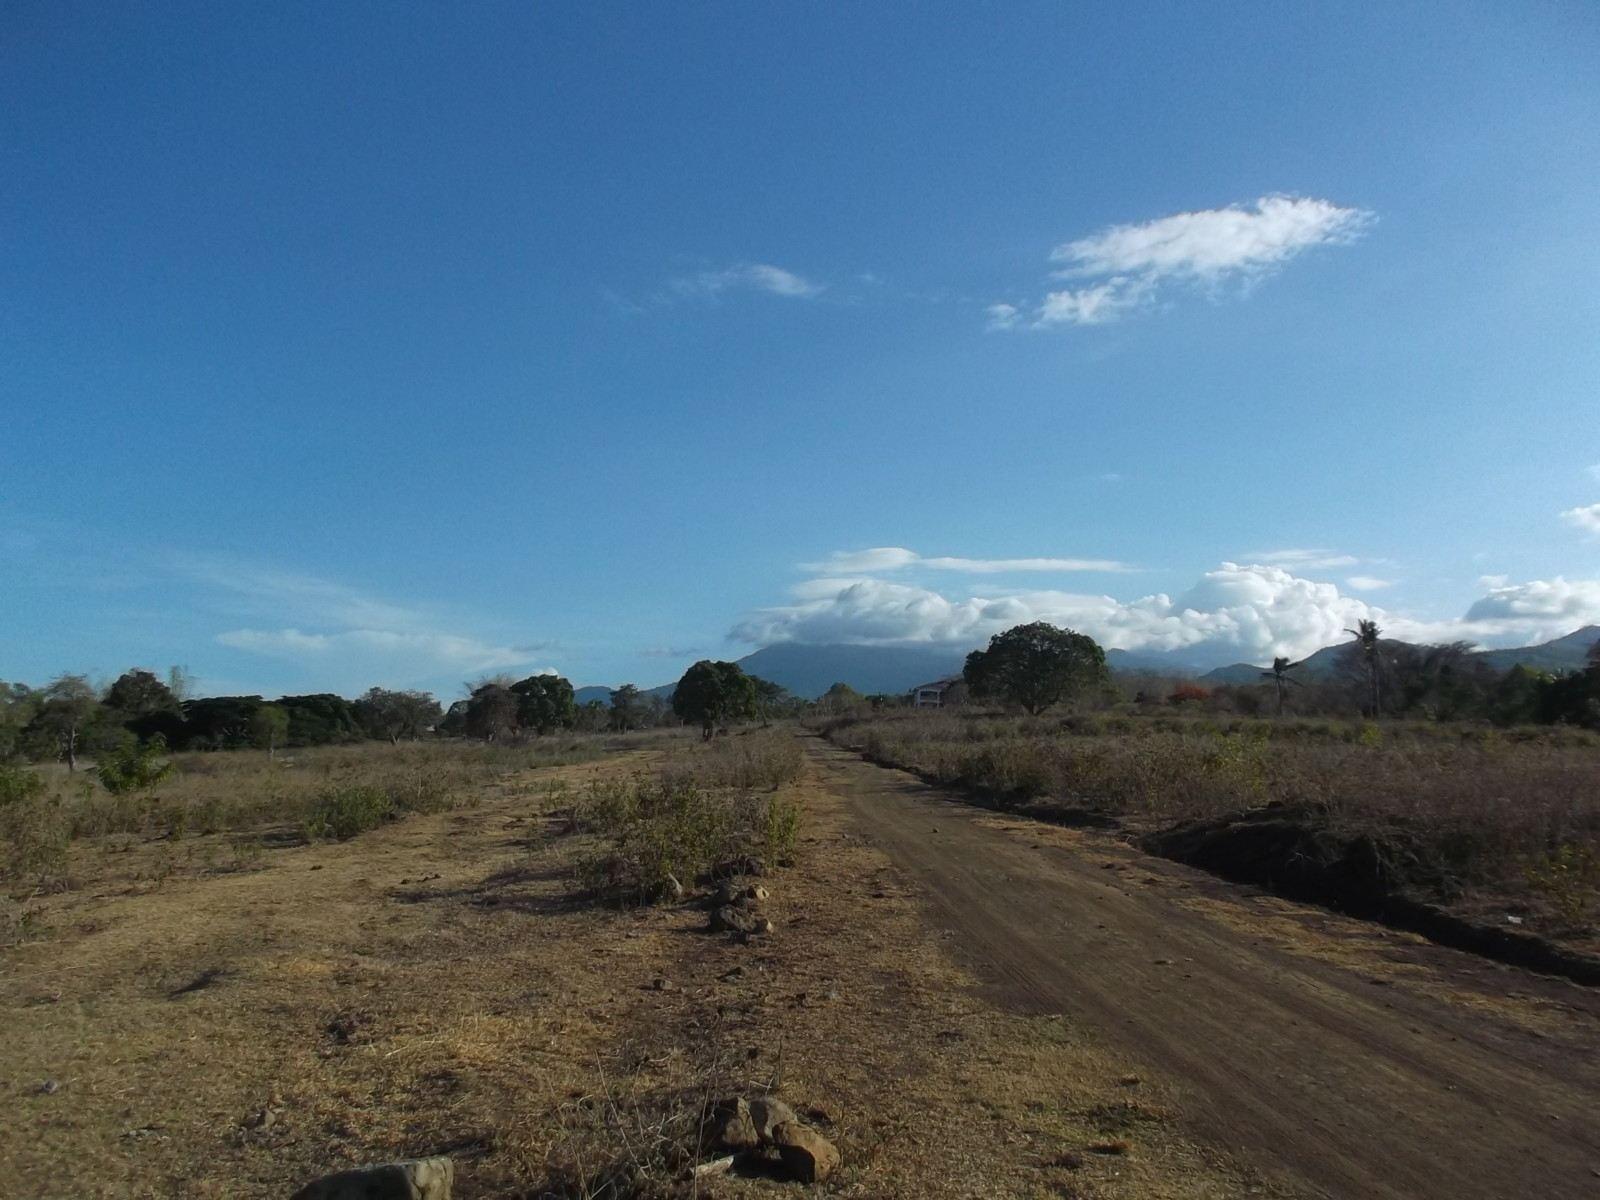 Development Land For Sale Near Golf Course Philx Pat